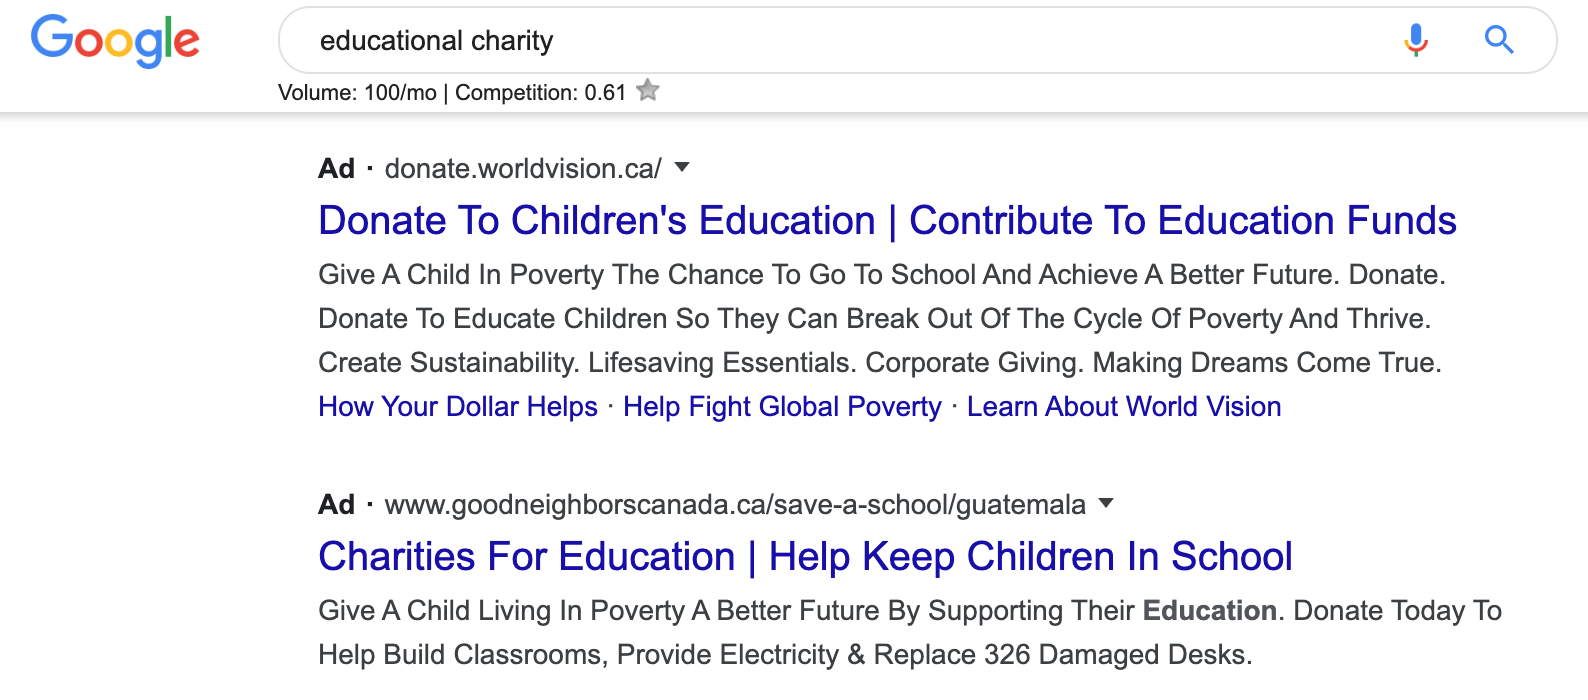 nonprofit advertising on google